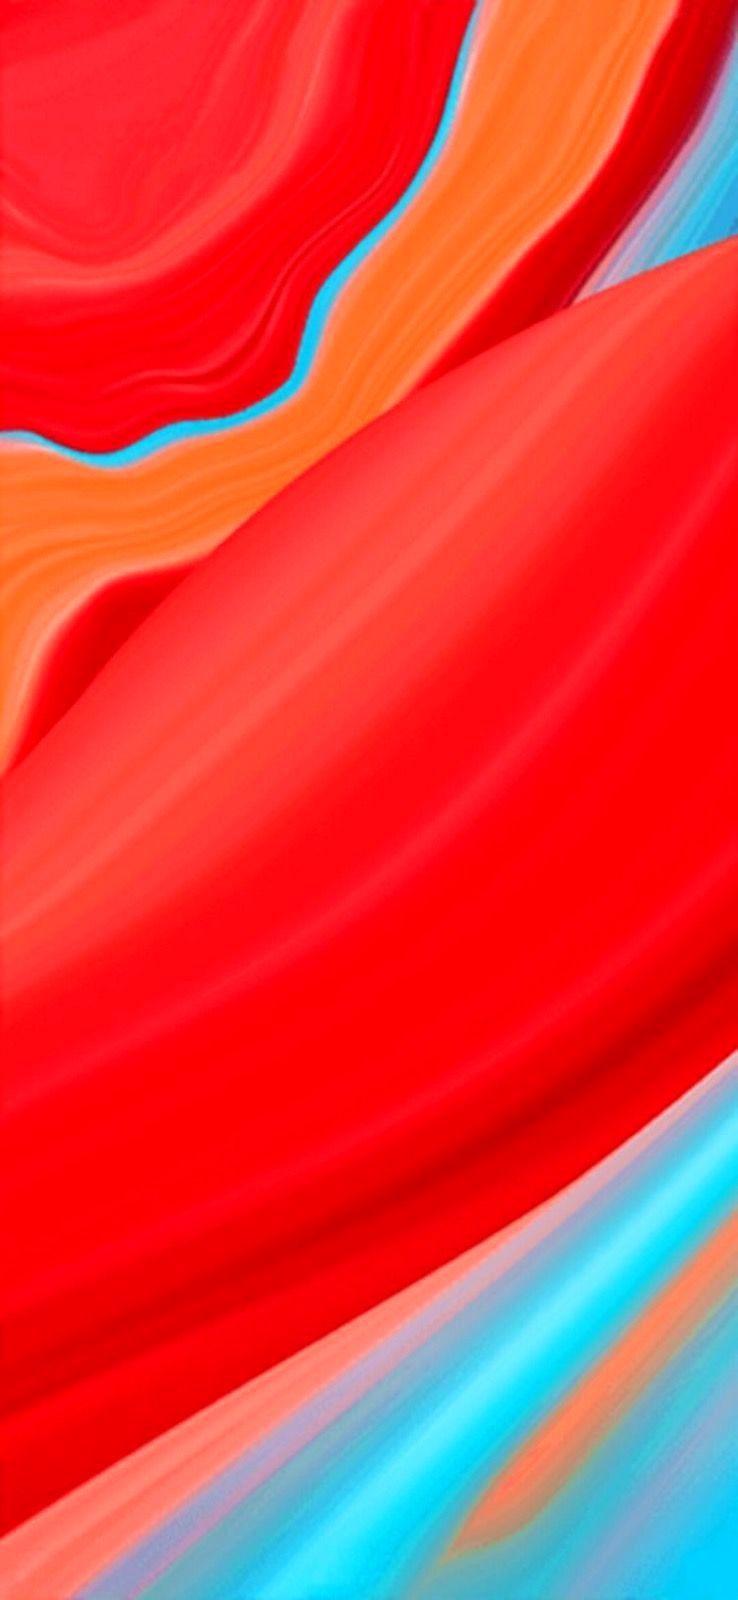 Wallpaper 4K Iphone Red Trick - wallpaper - #iphone #RED # ...